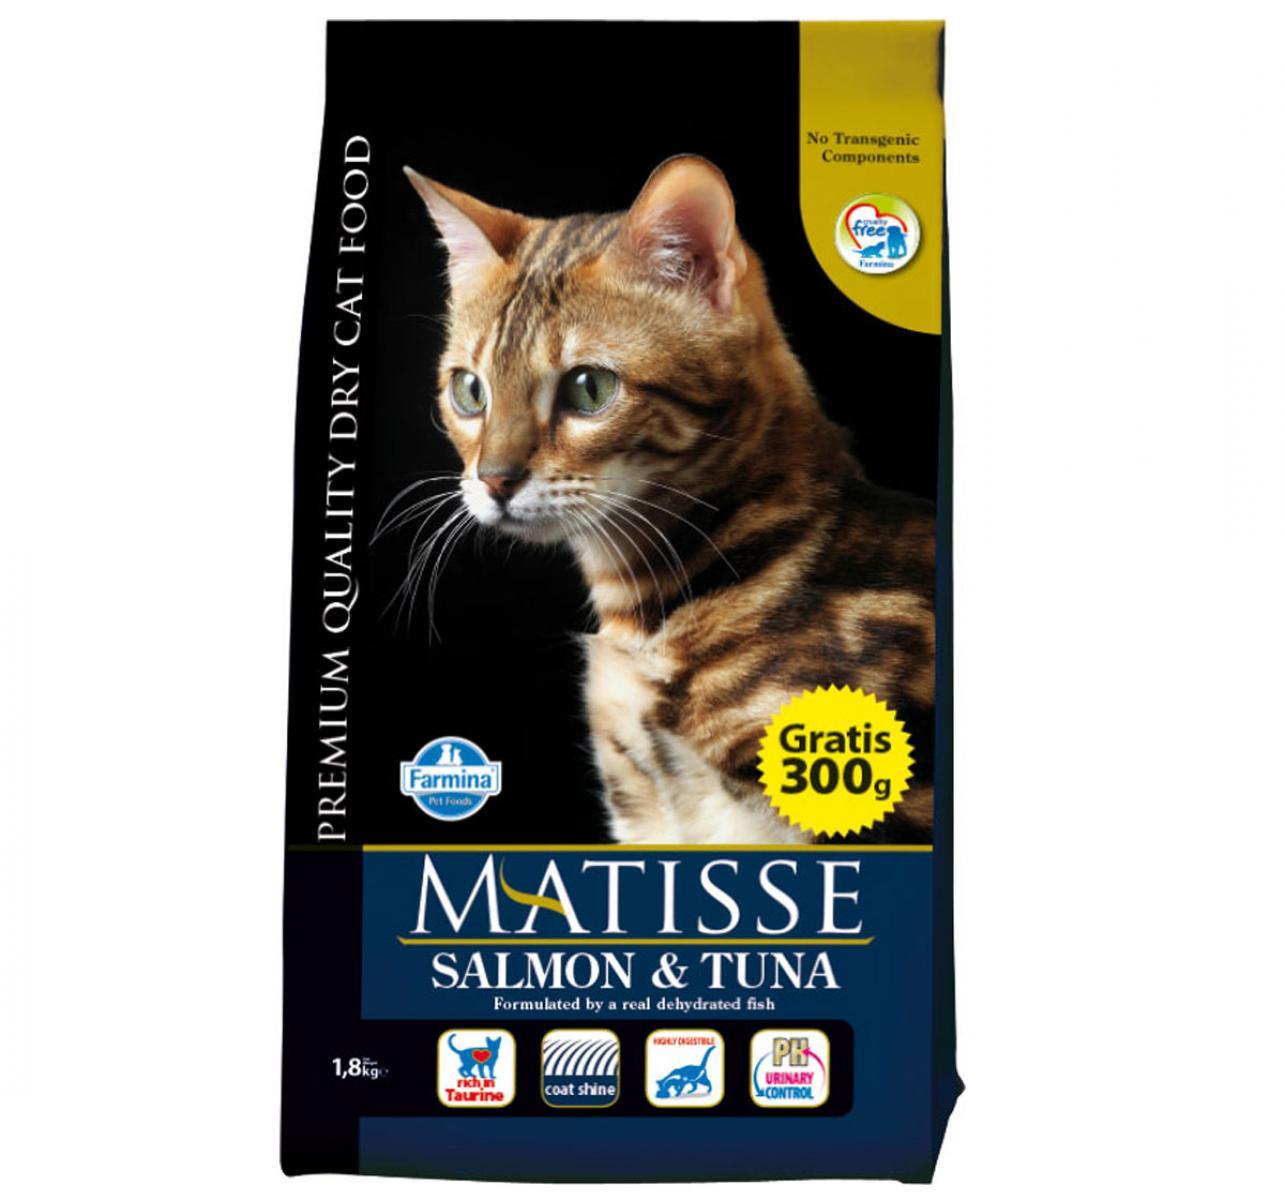 Matisse Adult Cat Food Salmon & Tuna - 1.8 Kg